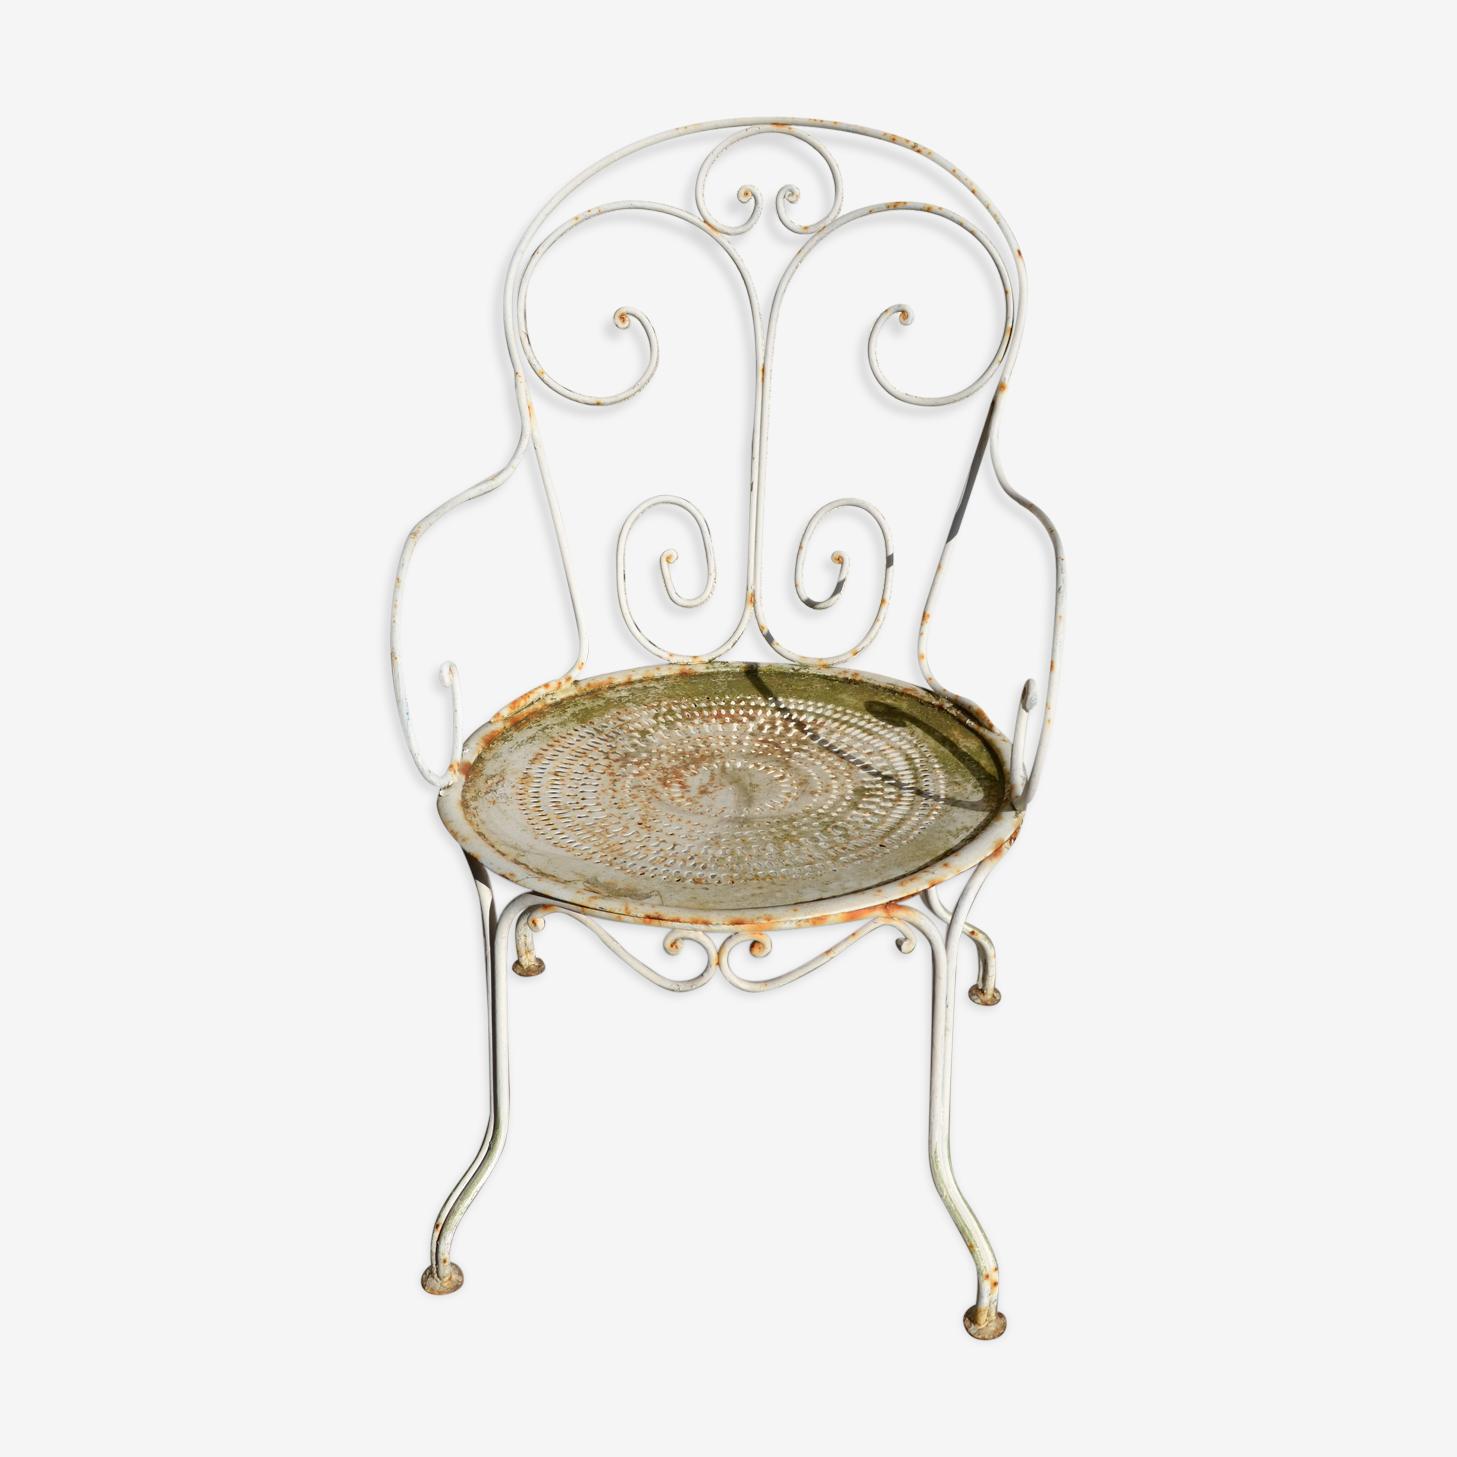 Tin outdoor Chair